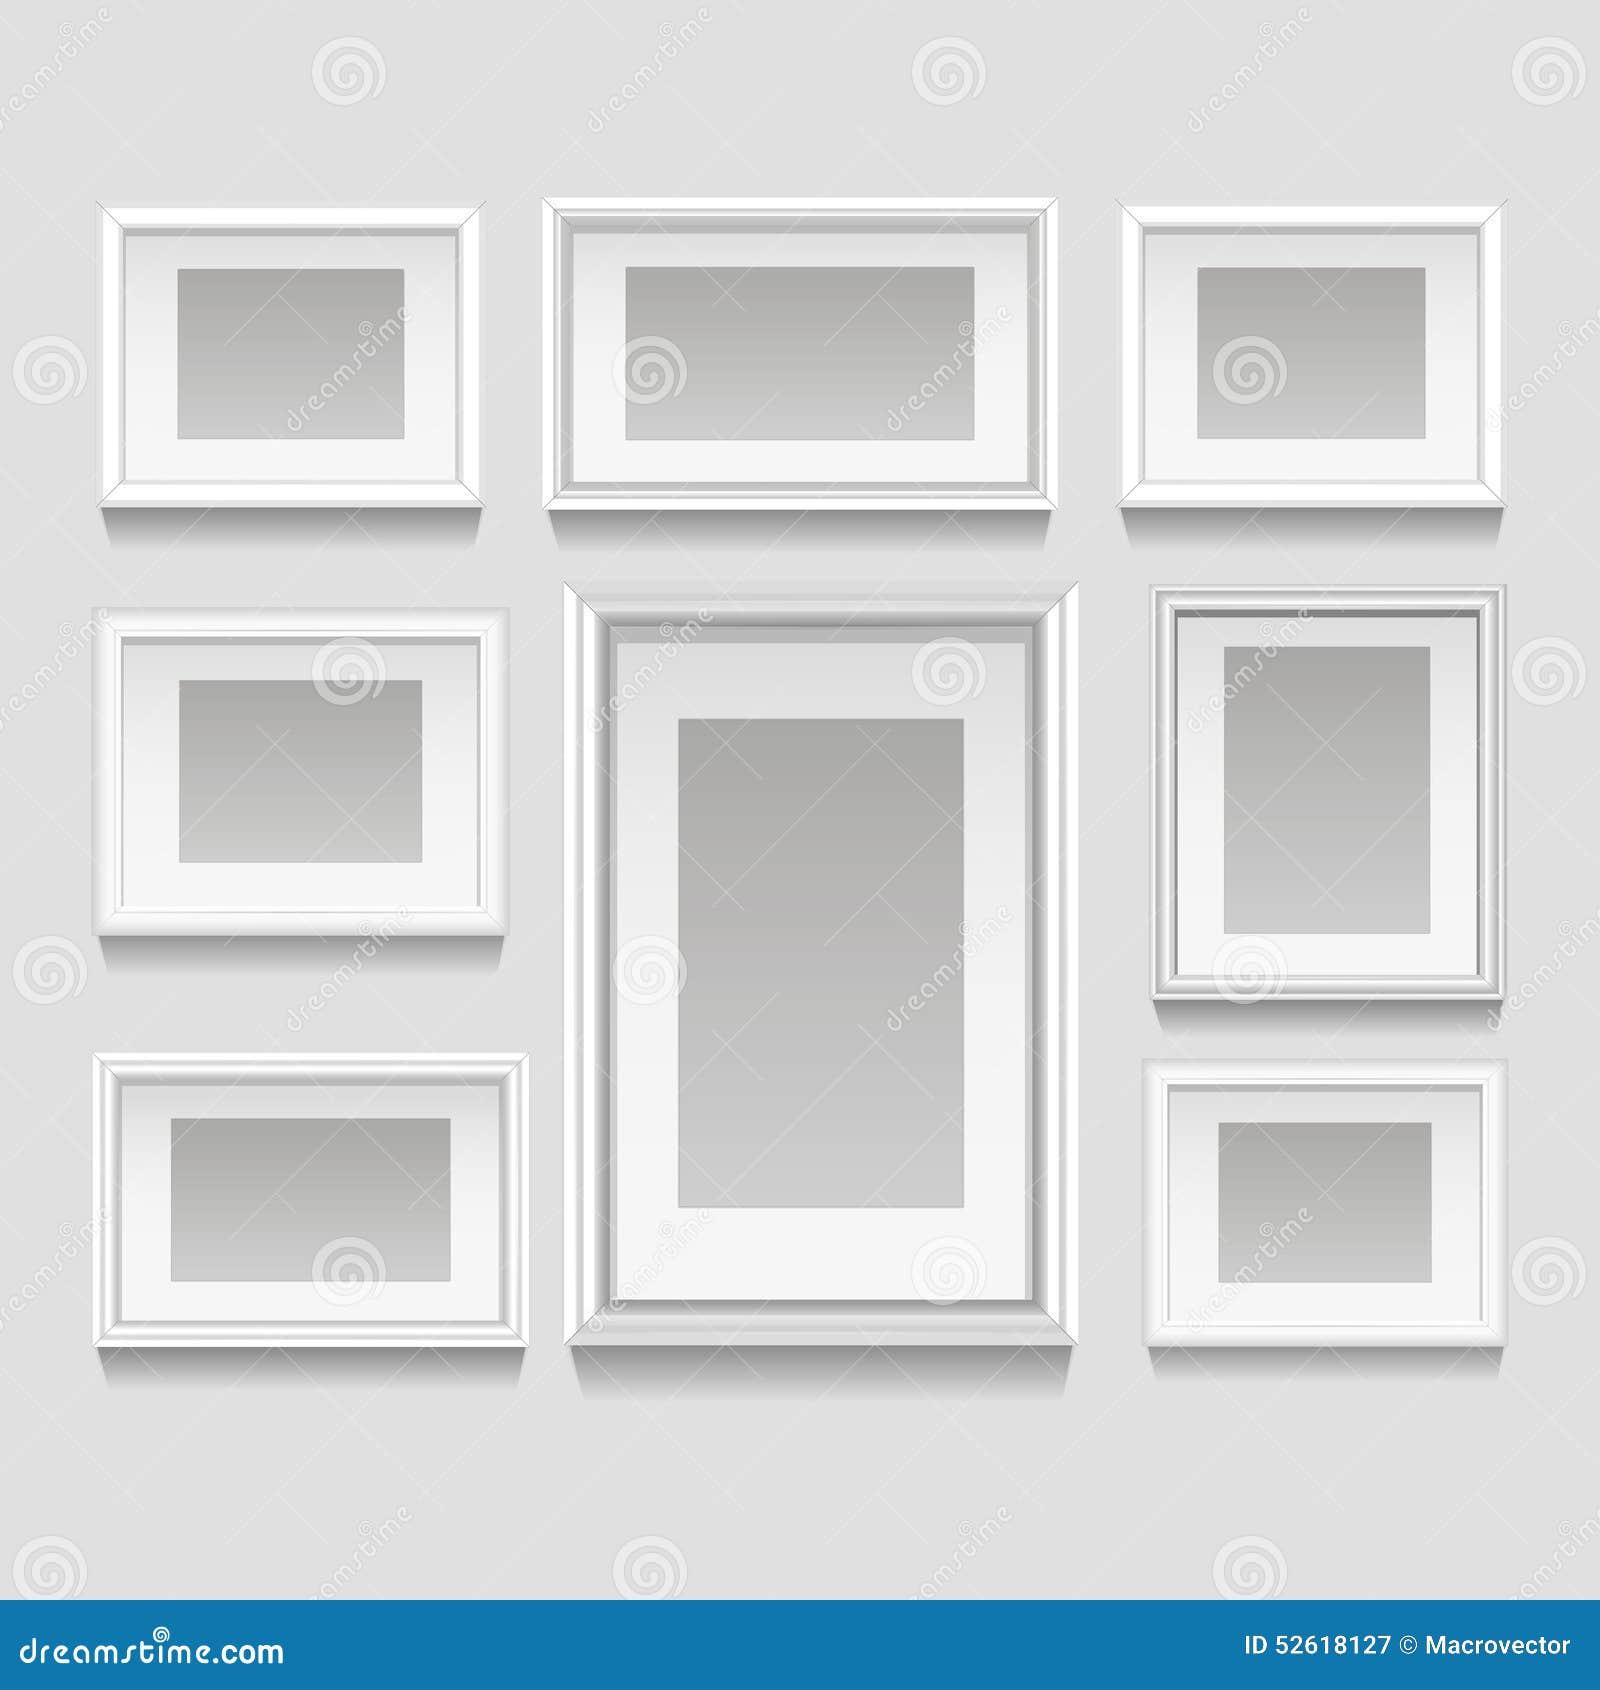 White Frame Set Part - 16: Royalty-Free Vector